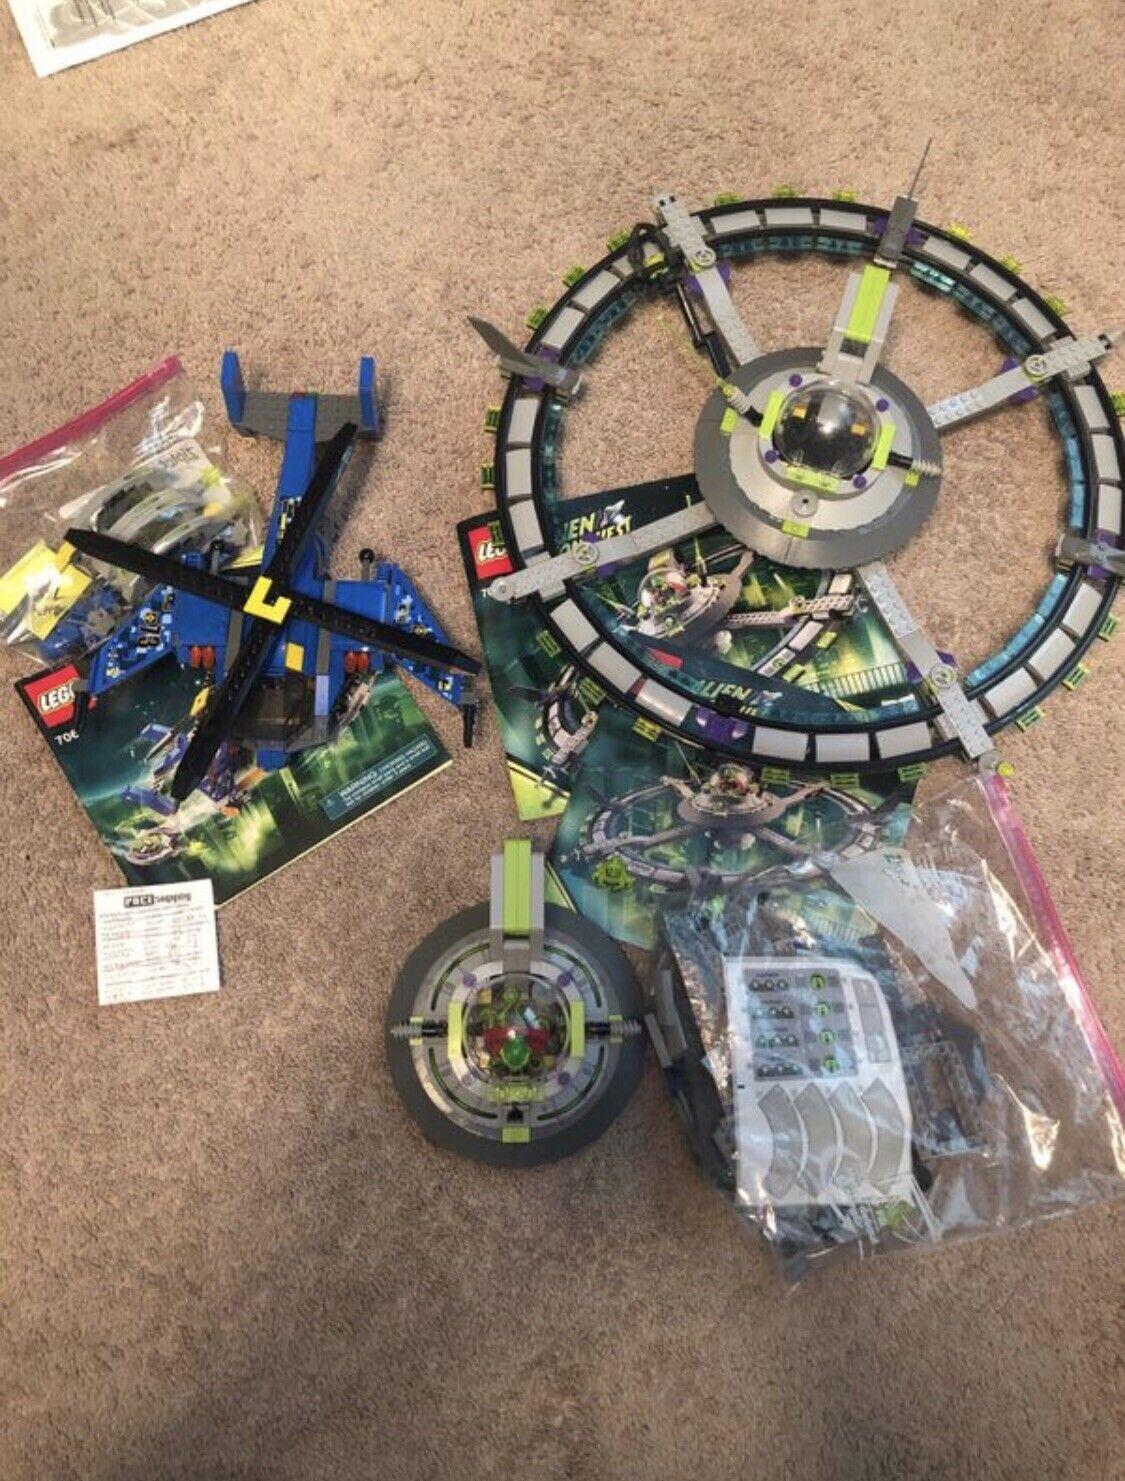 Lego-Alien Conquest - 7065 & 7067